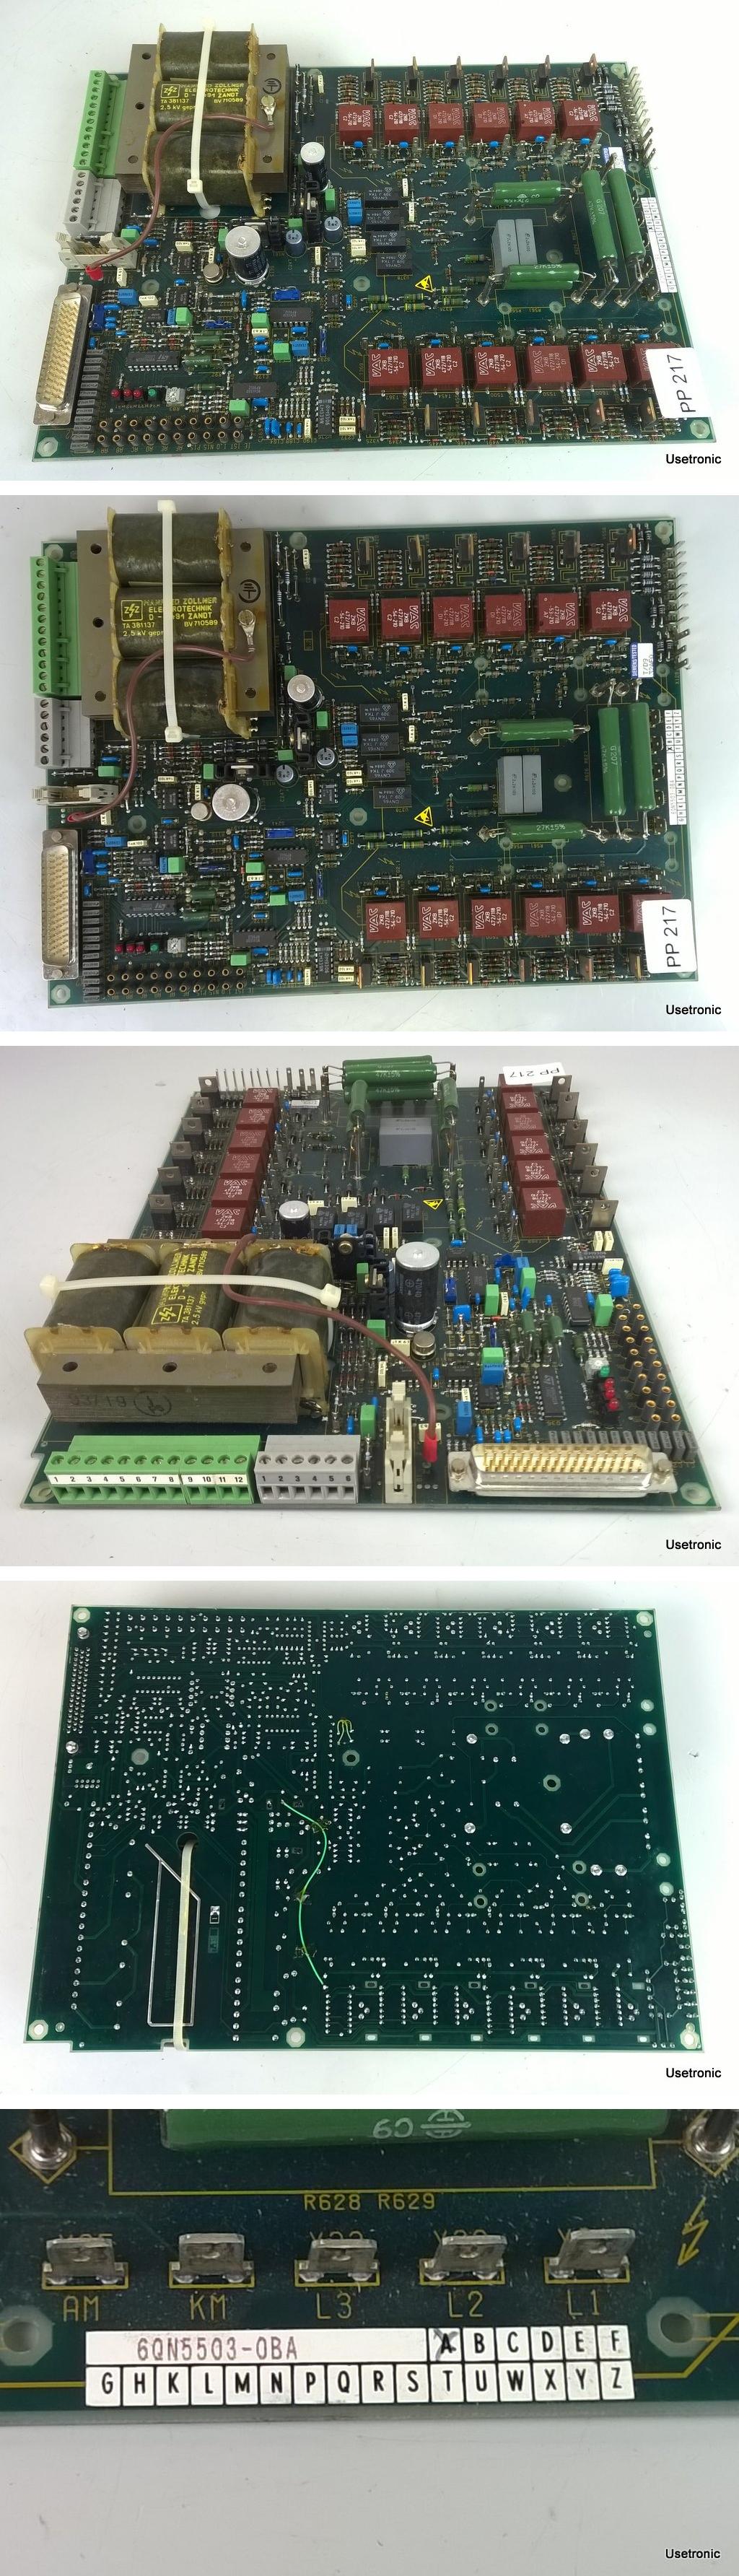 Siemens 6QN5503-0BA